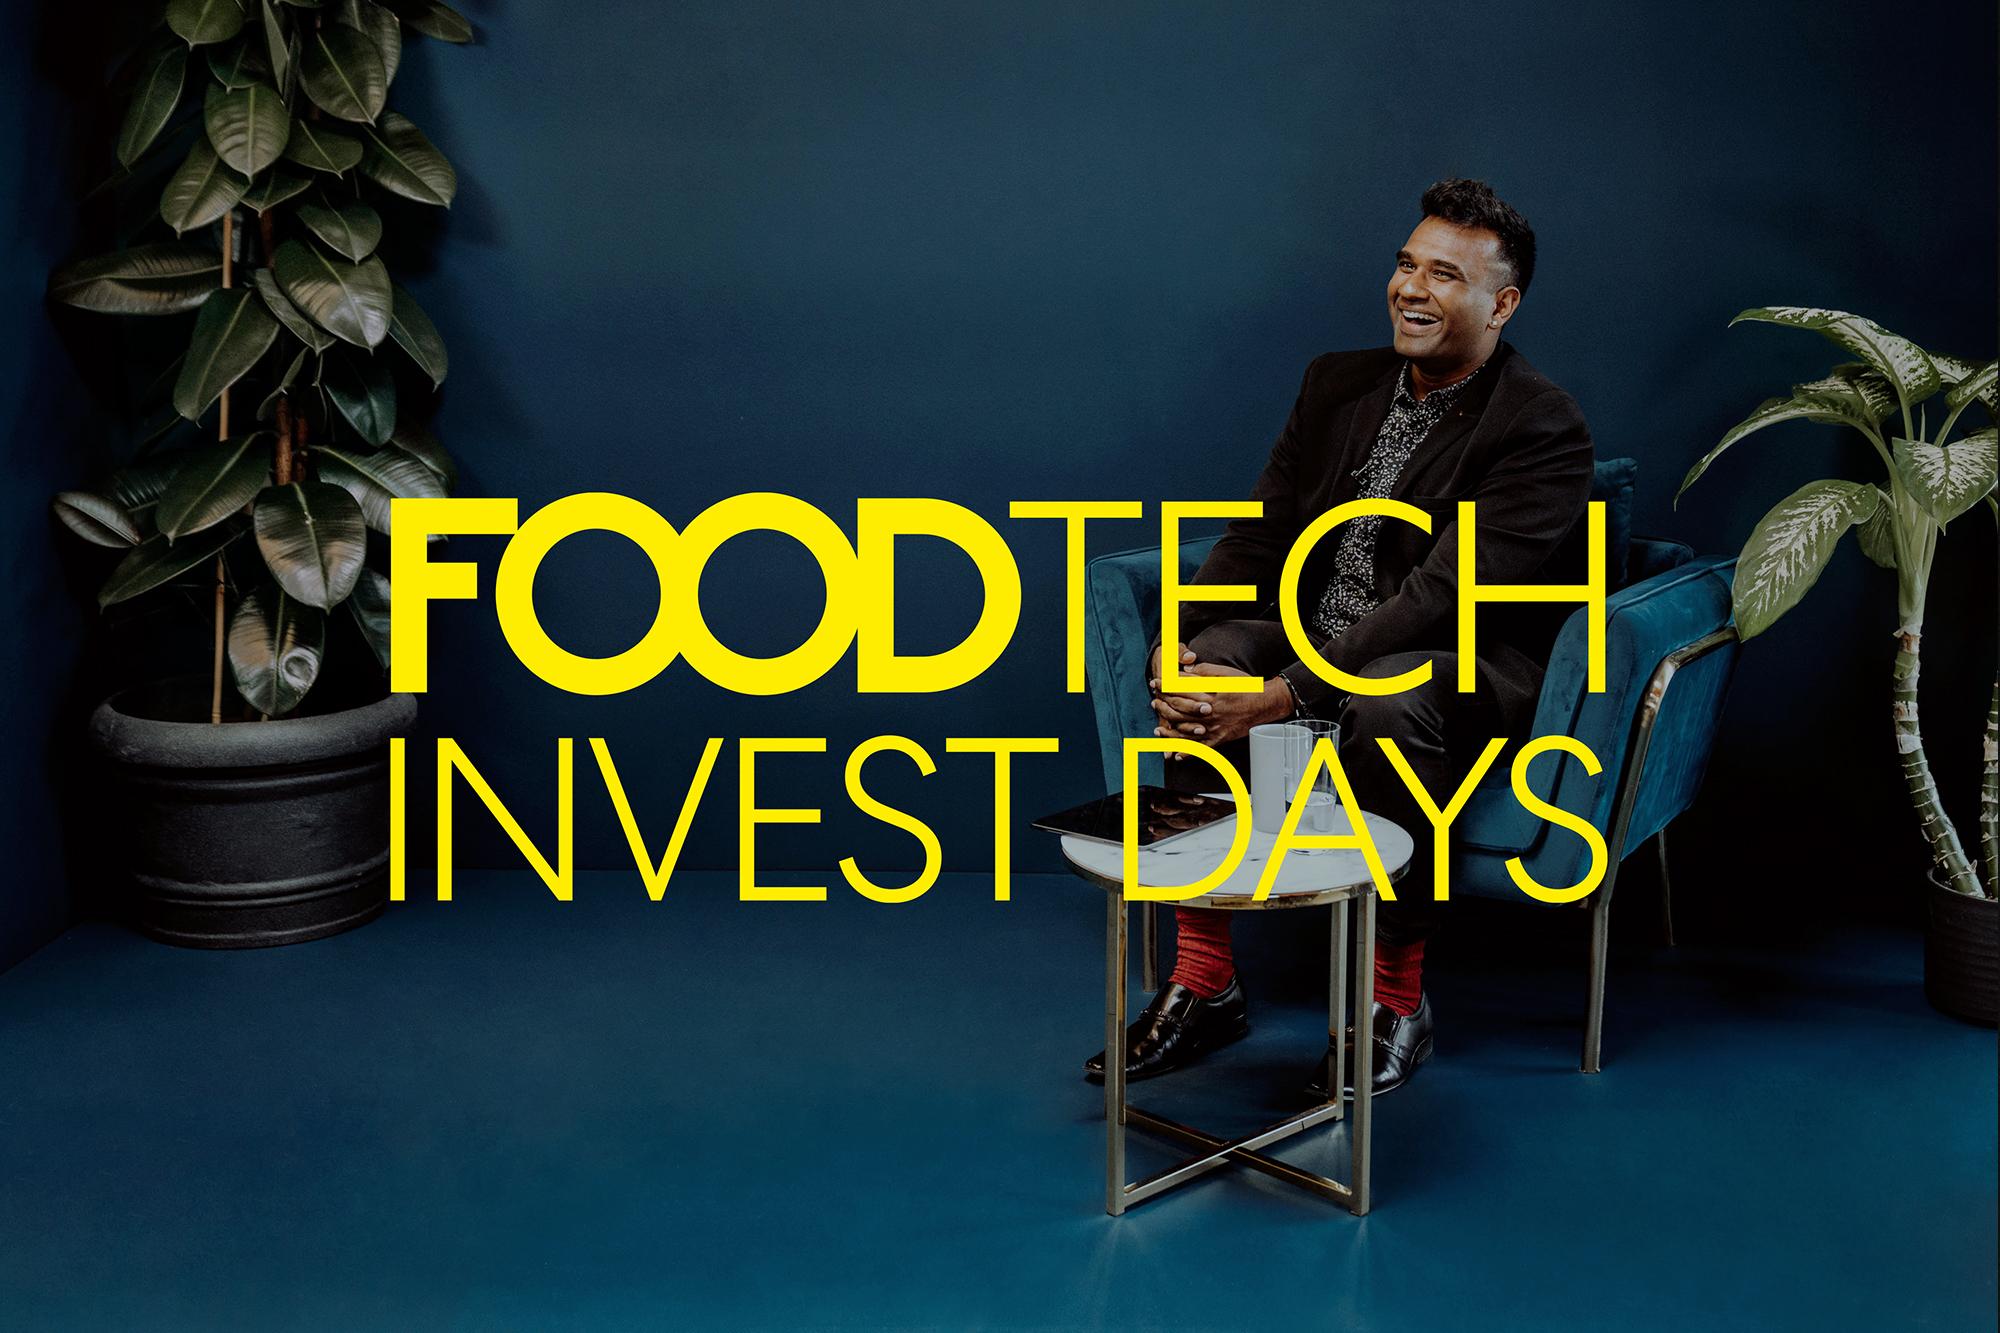 Food Tech Invest Days 2021 – Digitalkonferenz